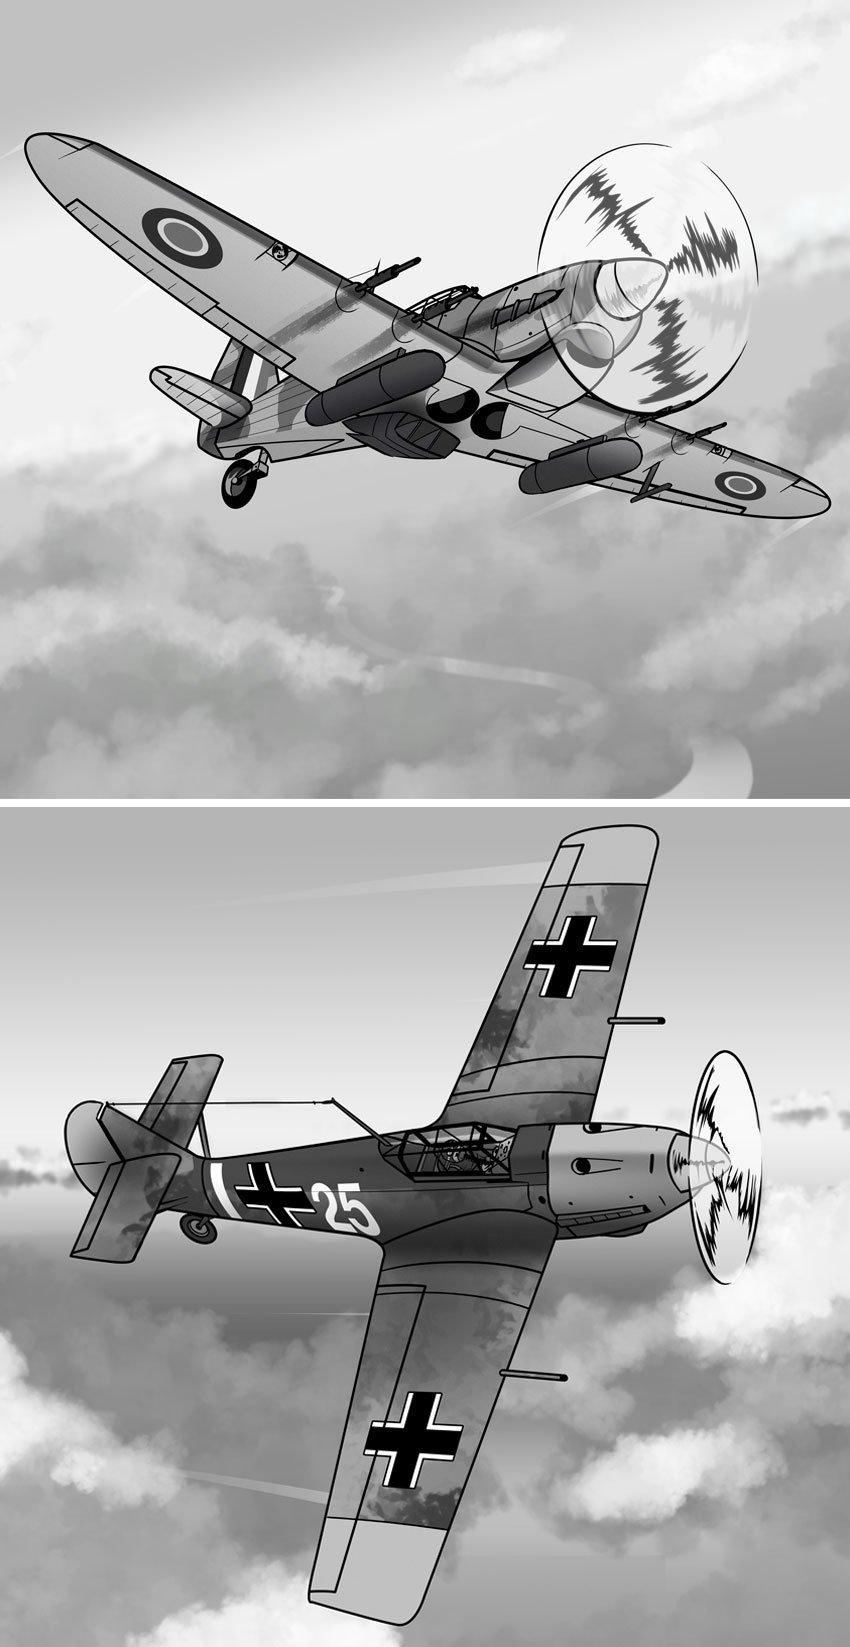 The Spitfire had companions like the Hurricane top and rivals like the Messerschmitt bottom